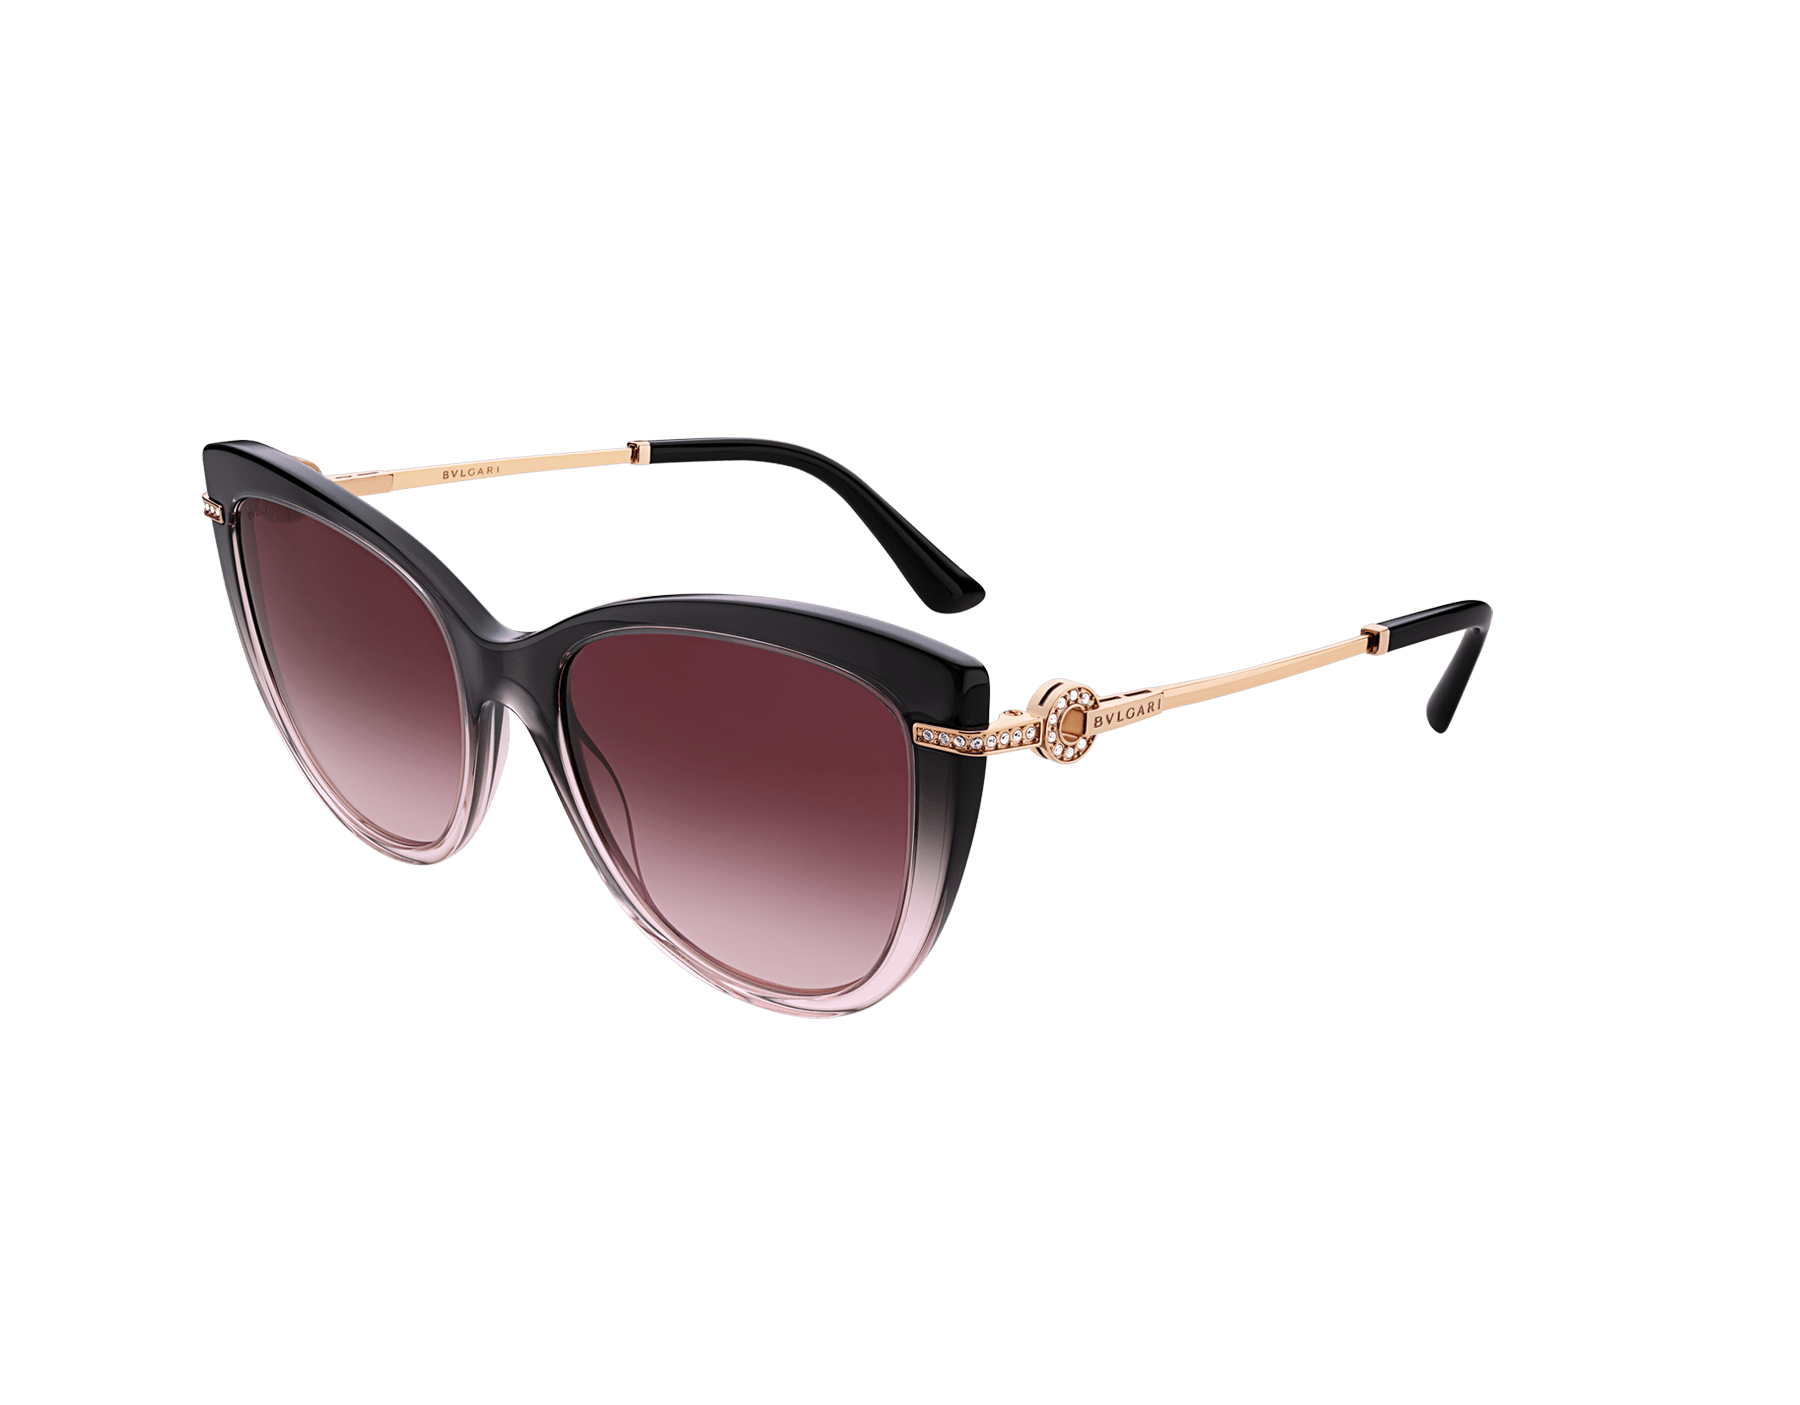 BVLGARI BVLGARI cat-eye acetate sunglasses with metal décor and crystals. 903802 image 1